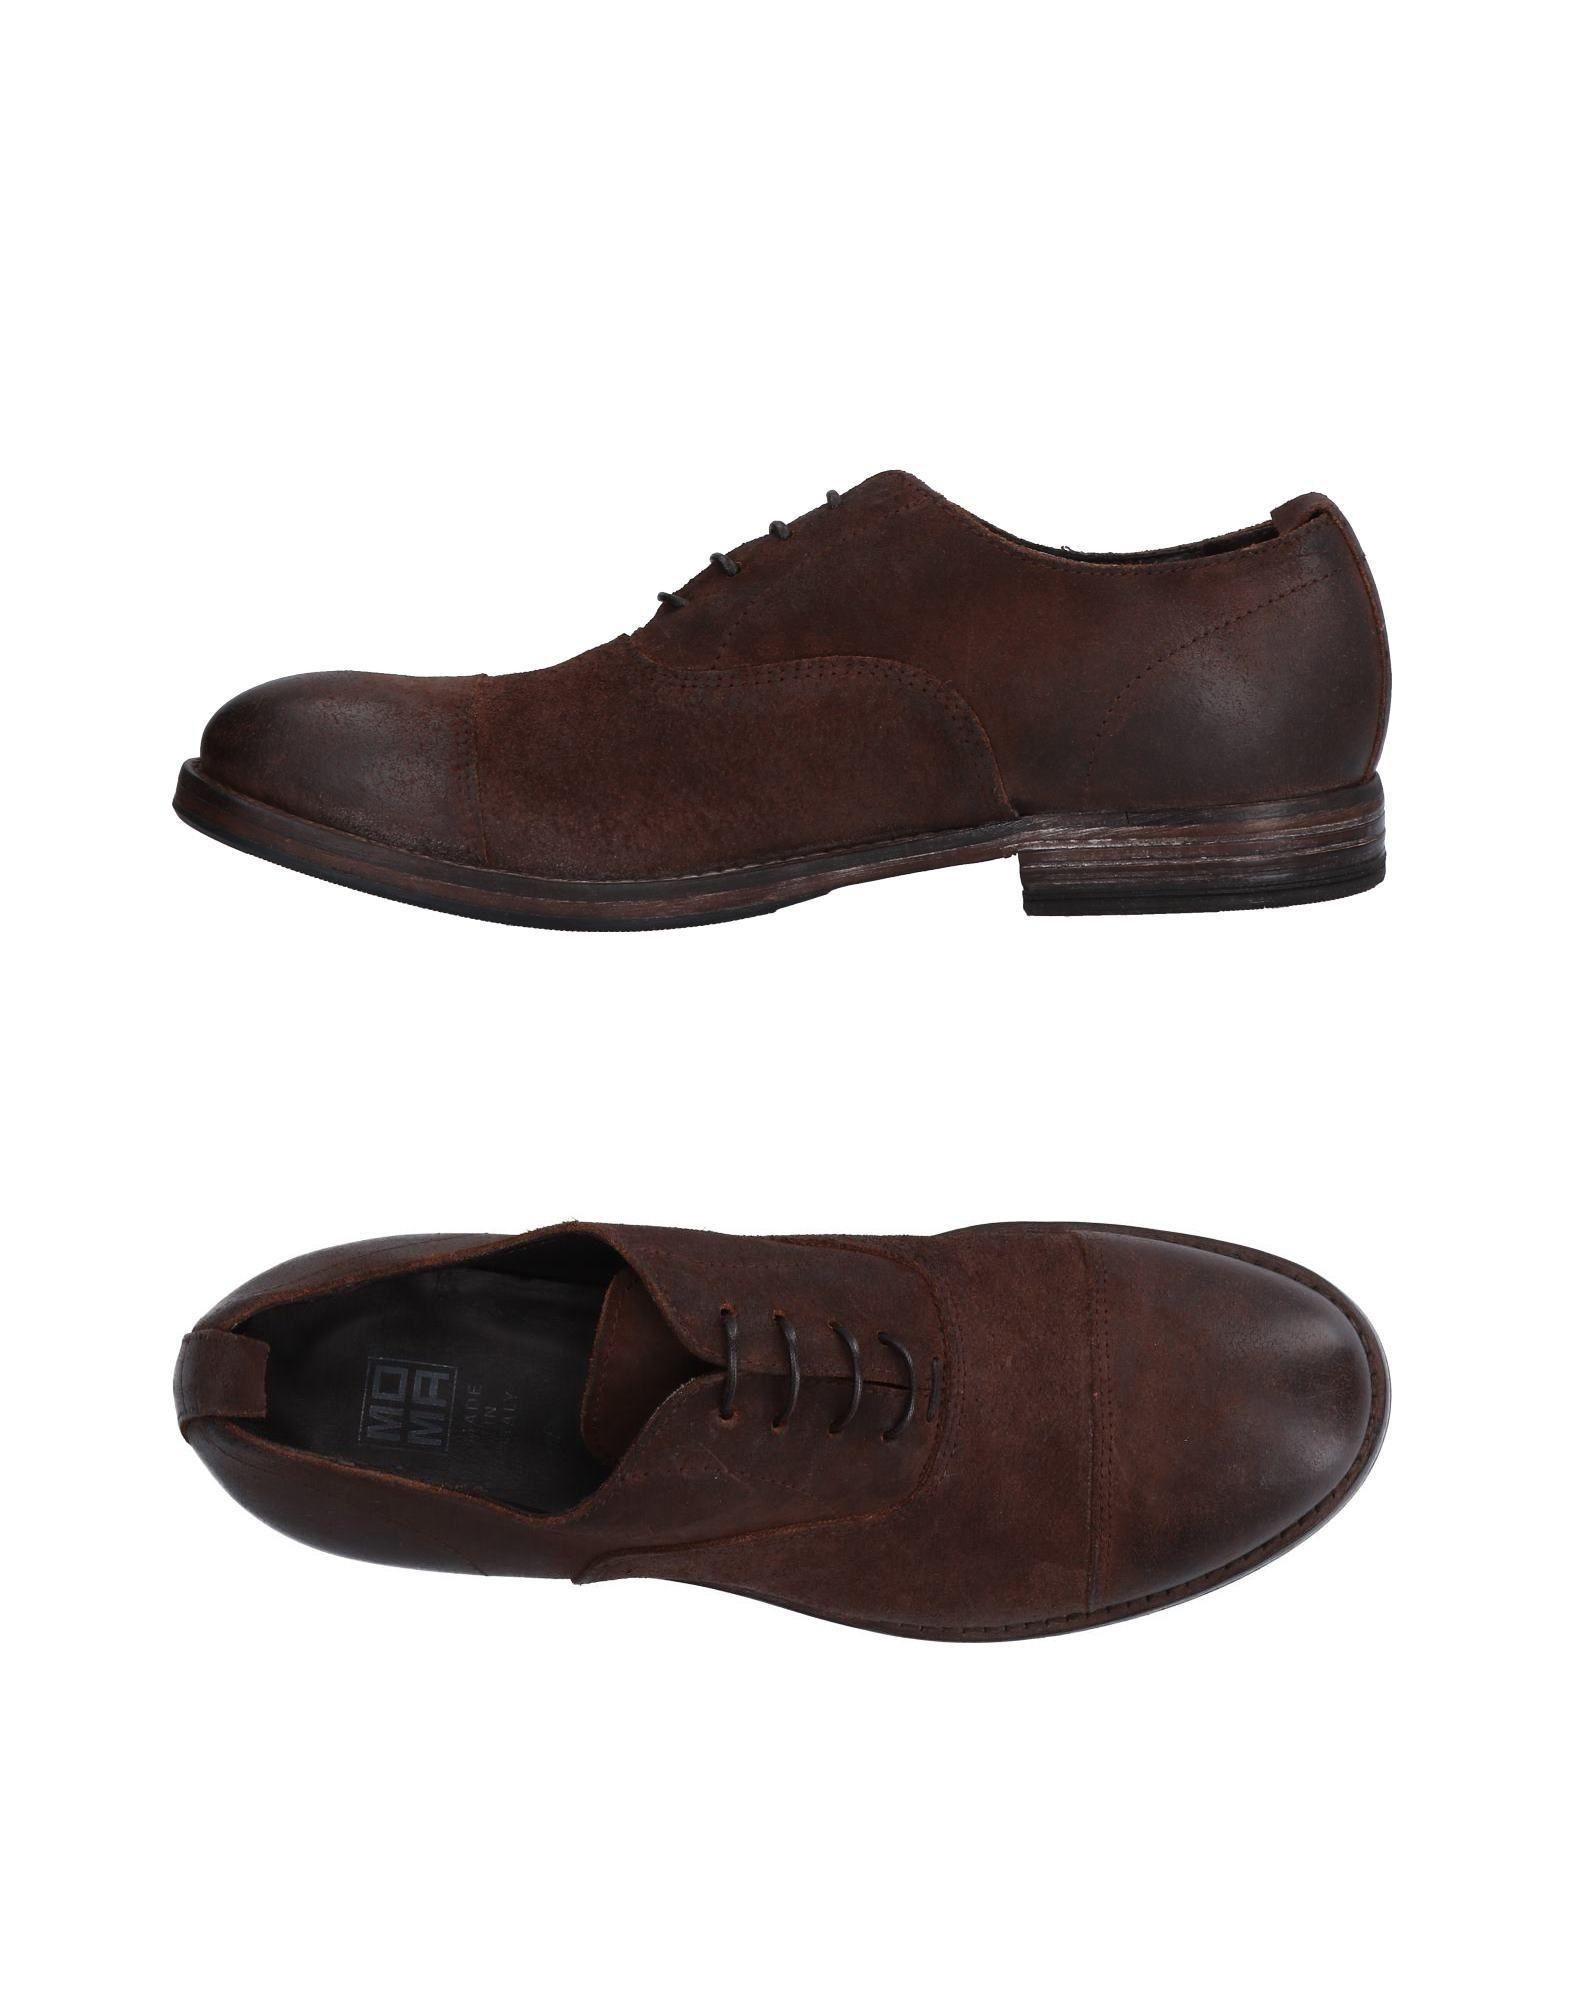 Moma Schnürschuhe Herren  11516618CS Gute Qualität beliebte Schuhe